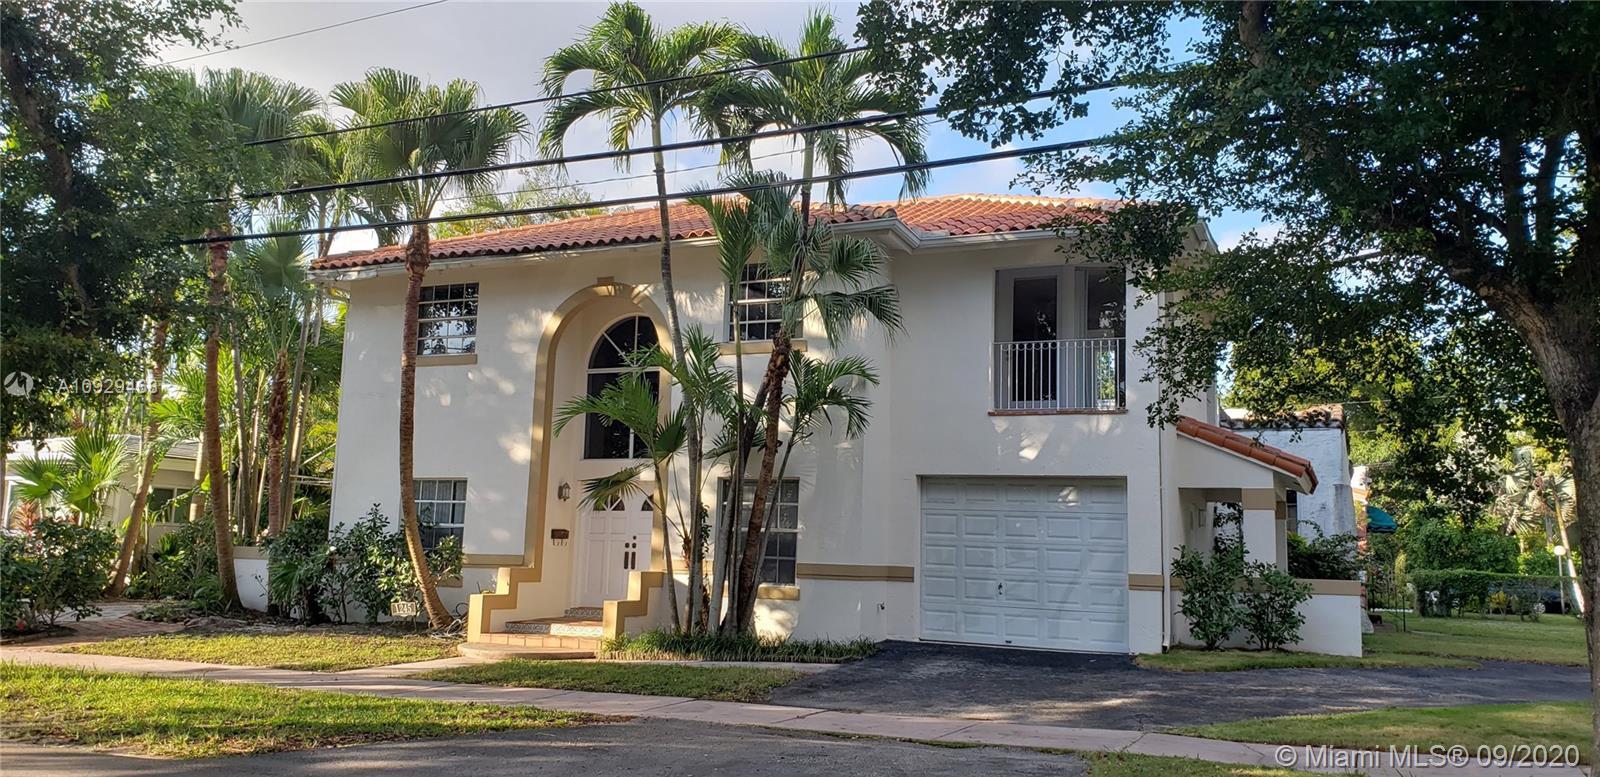 1245  Venetia Ave  For Sale A10929468, FL